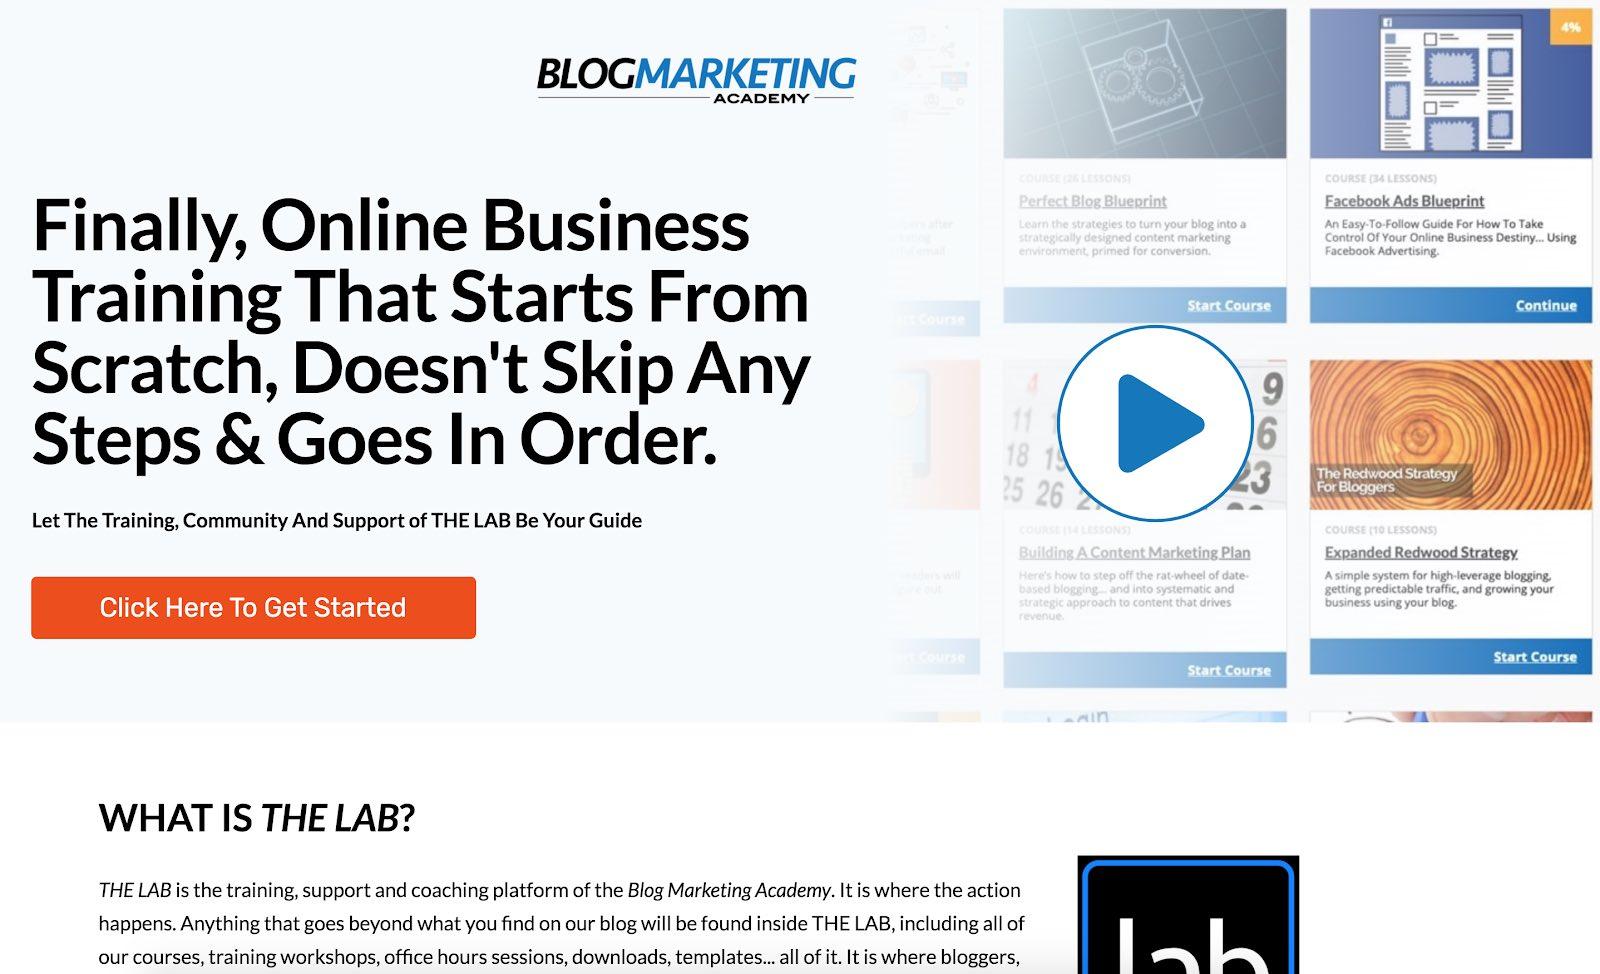 Blog Marketing Academy